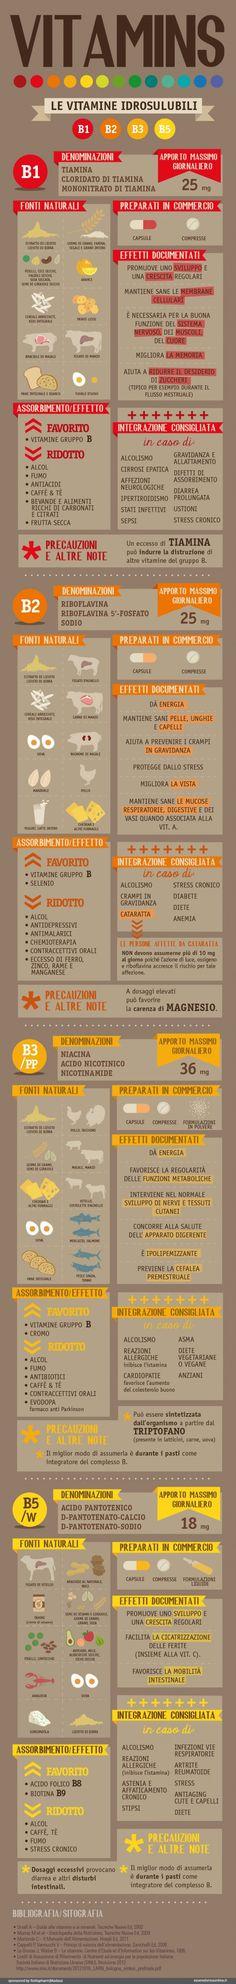 Vitamine Idrosolubili 1 - Infografica di Esseredonnaonline